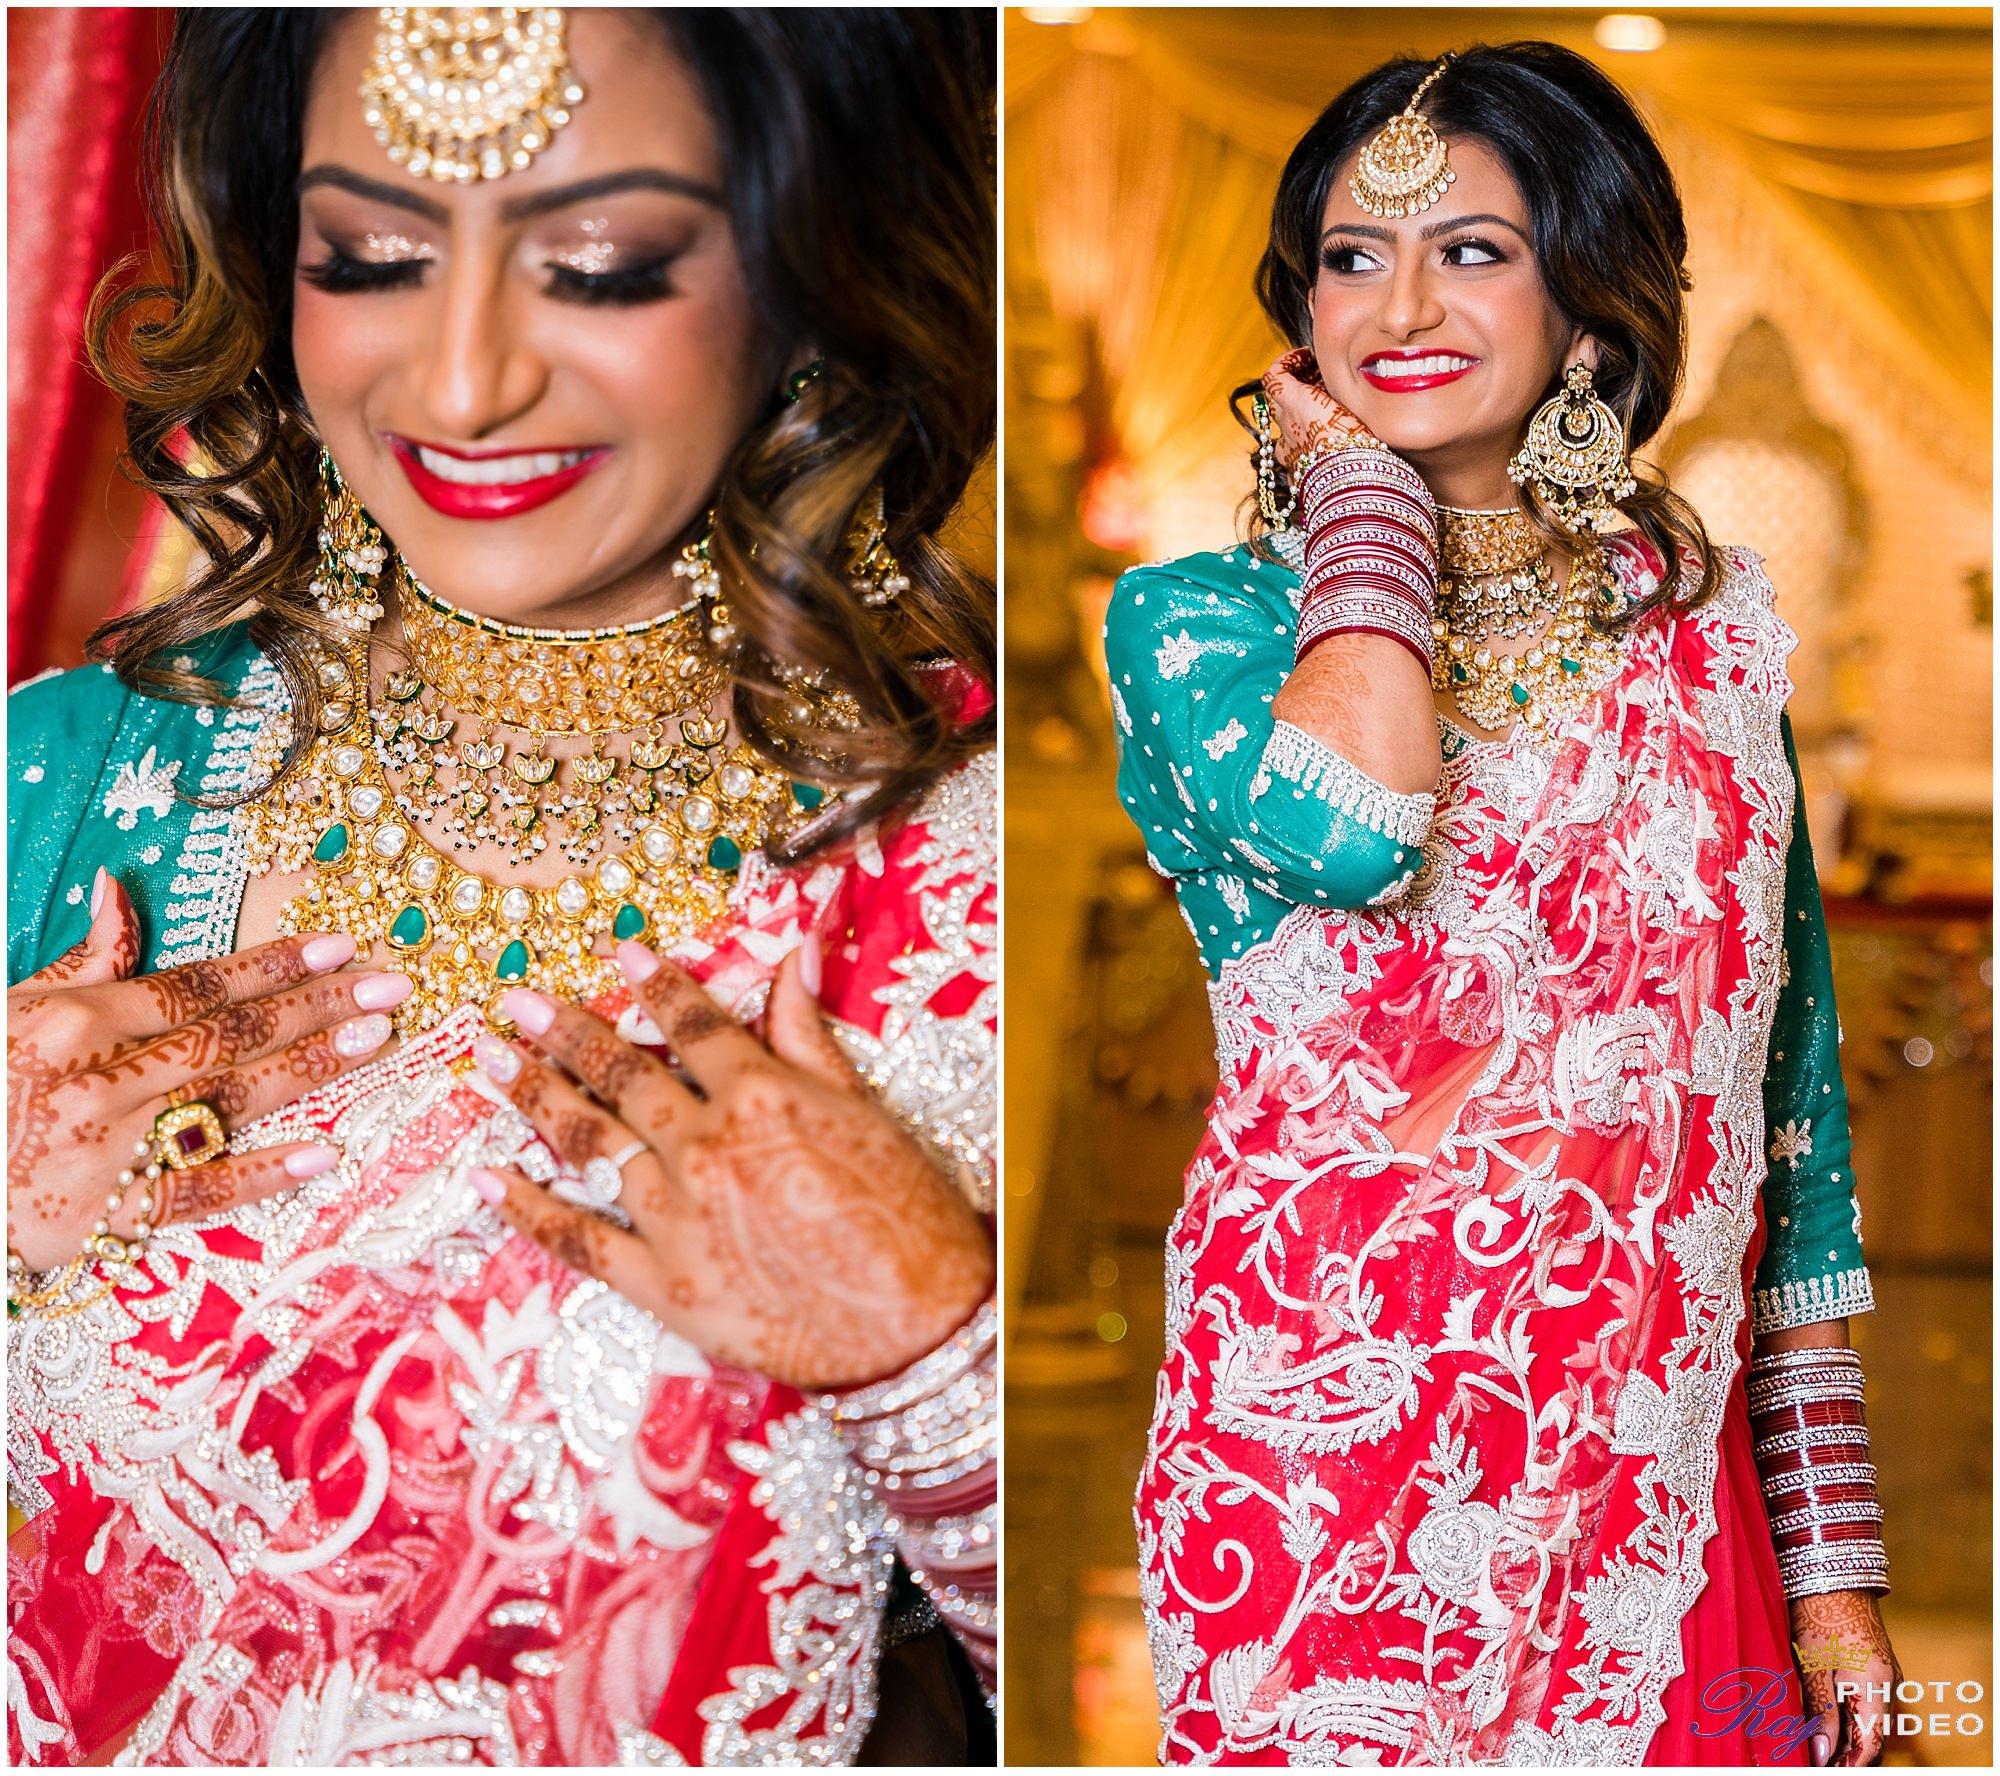 Sri-Guruvaayoorappan-Temple-Marlboro-NJ-Indian-Wedding-Chiyomi-Scott-00009.jpg